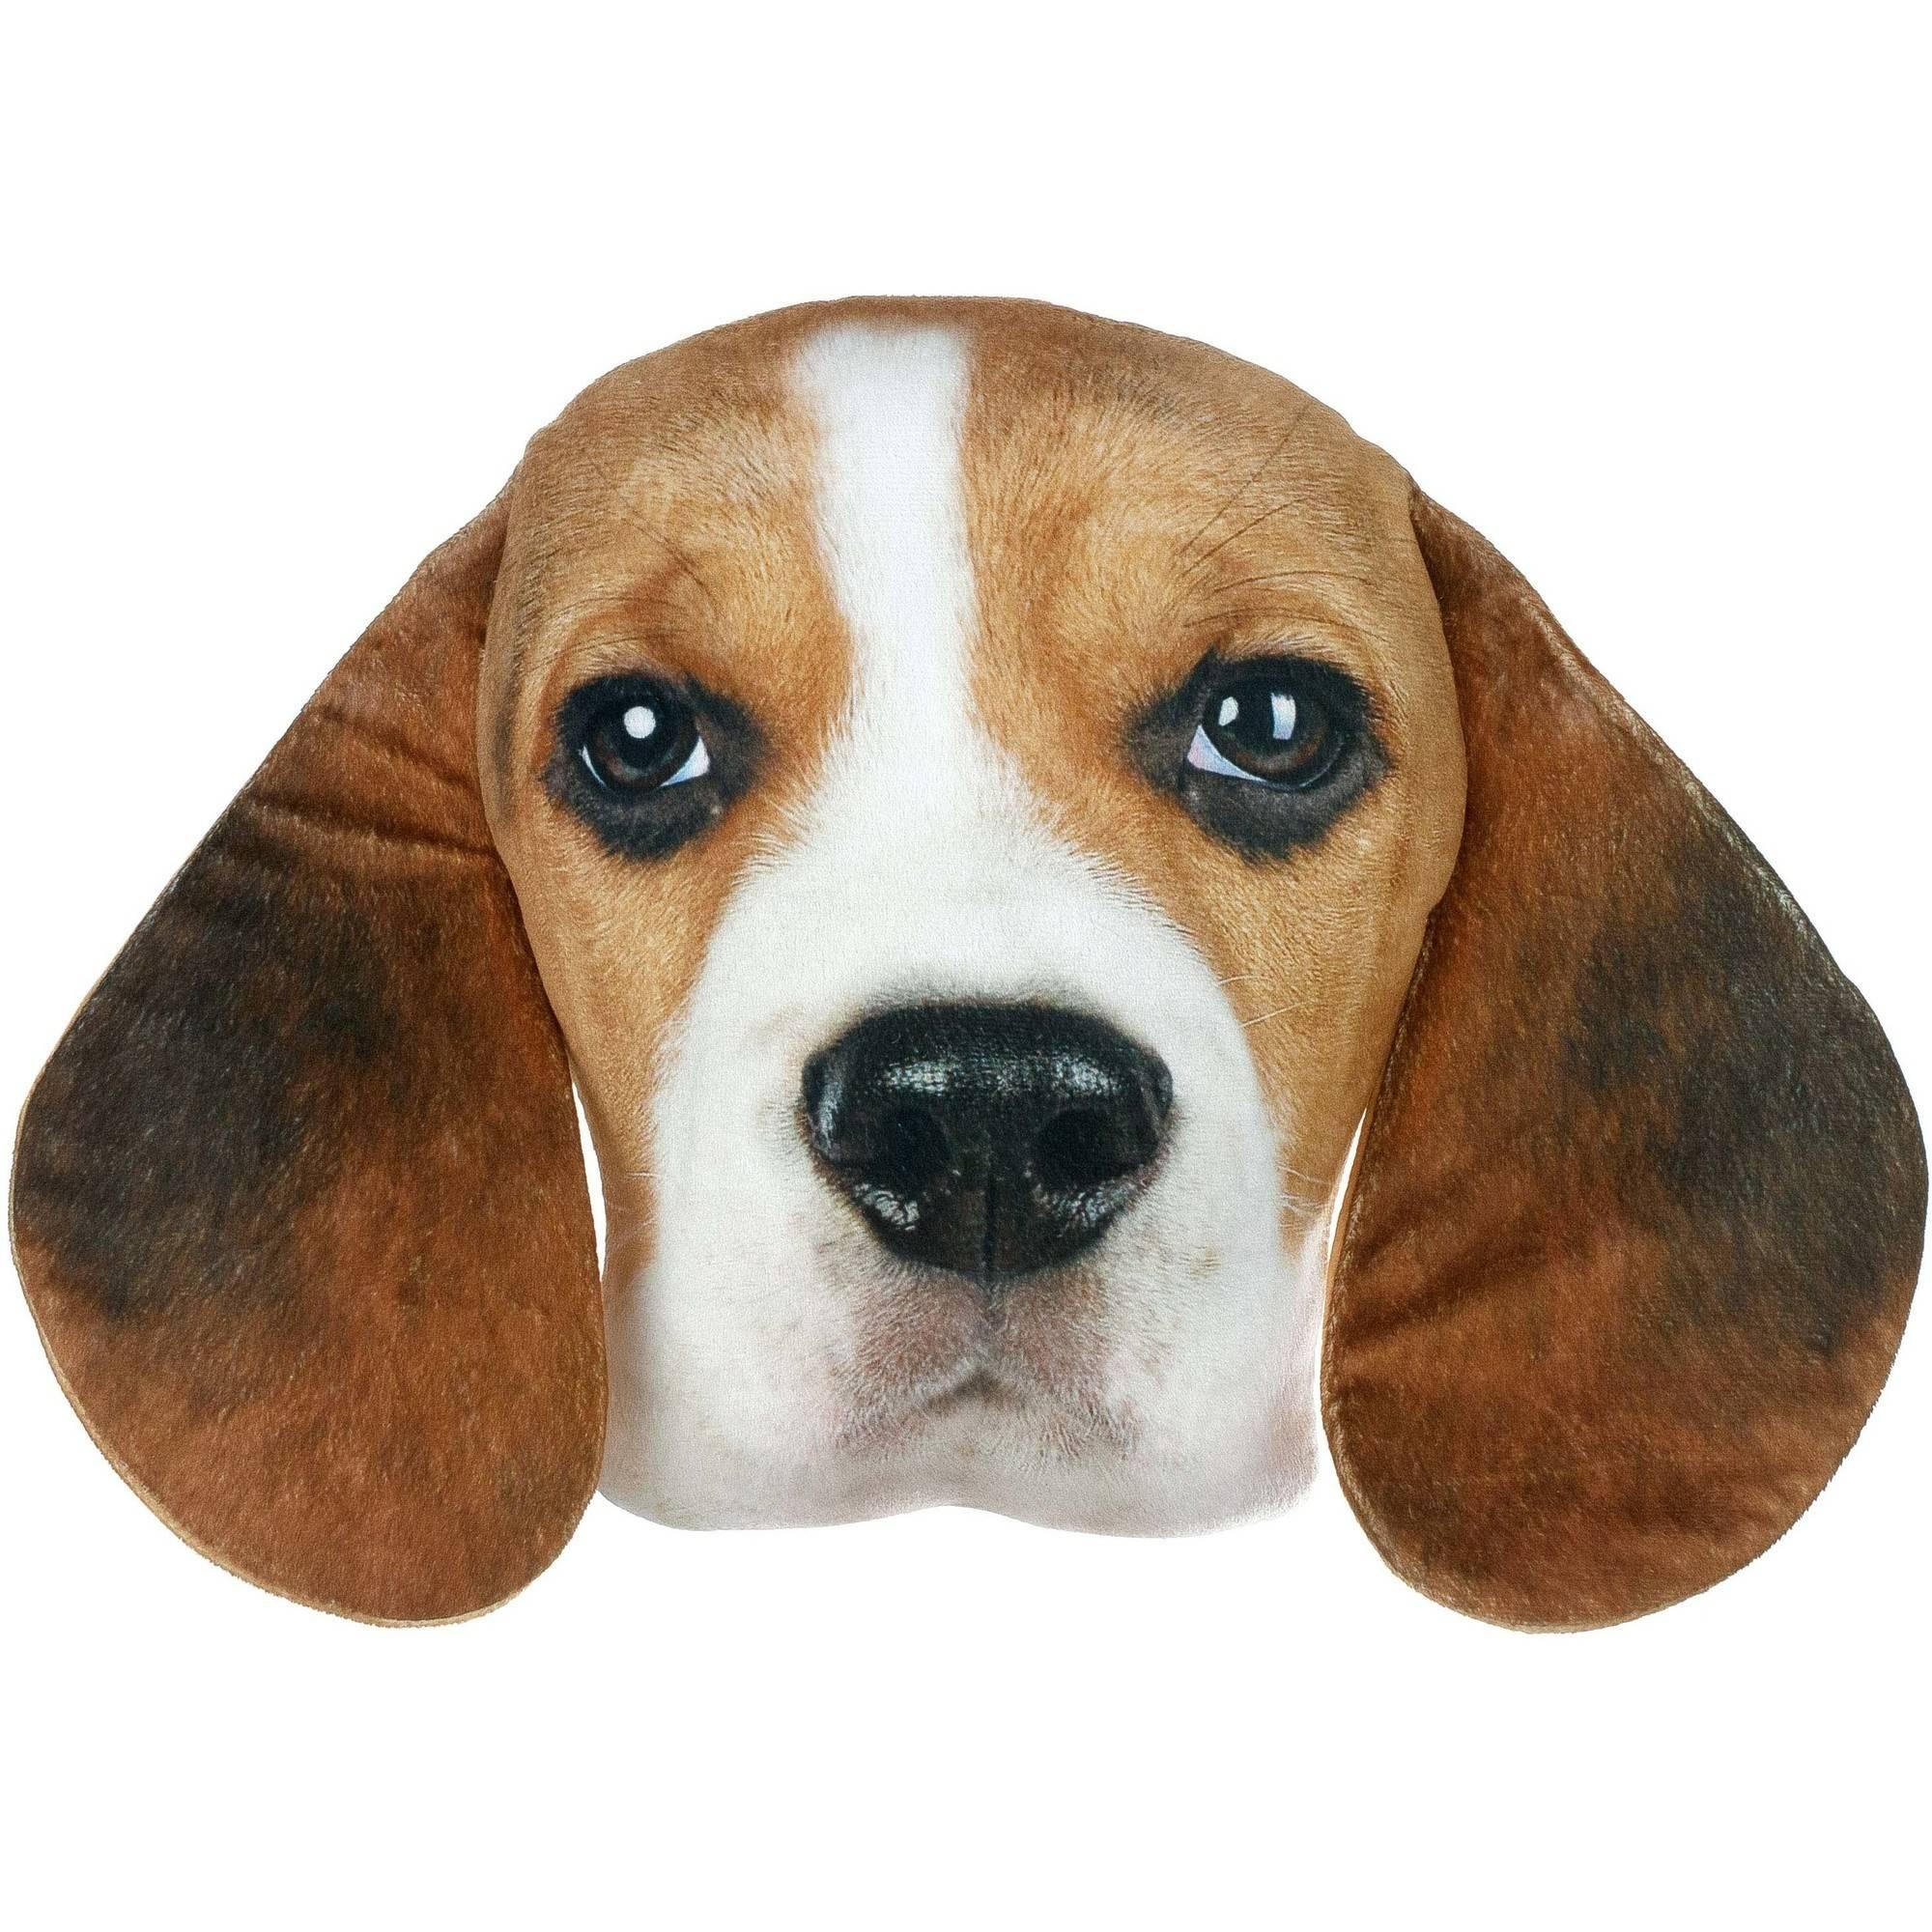 Beagle Dog Plush Pillow